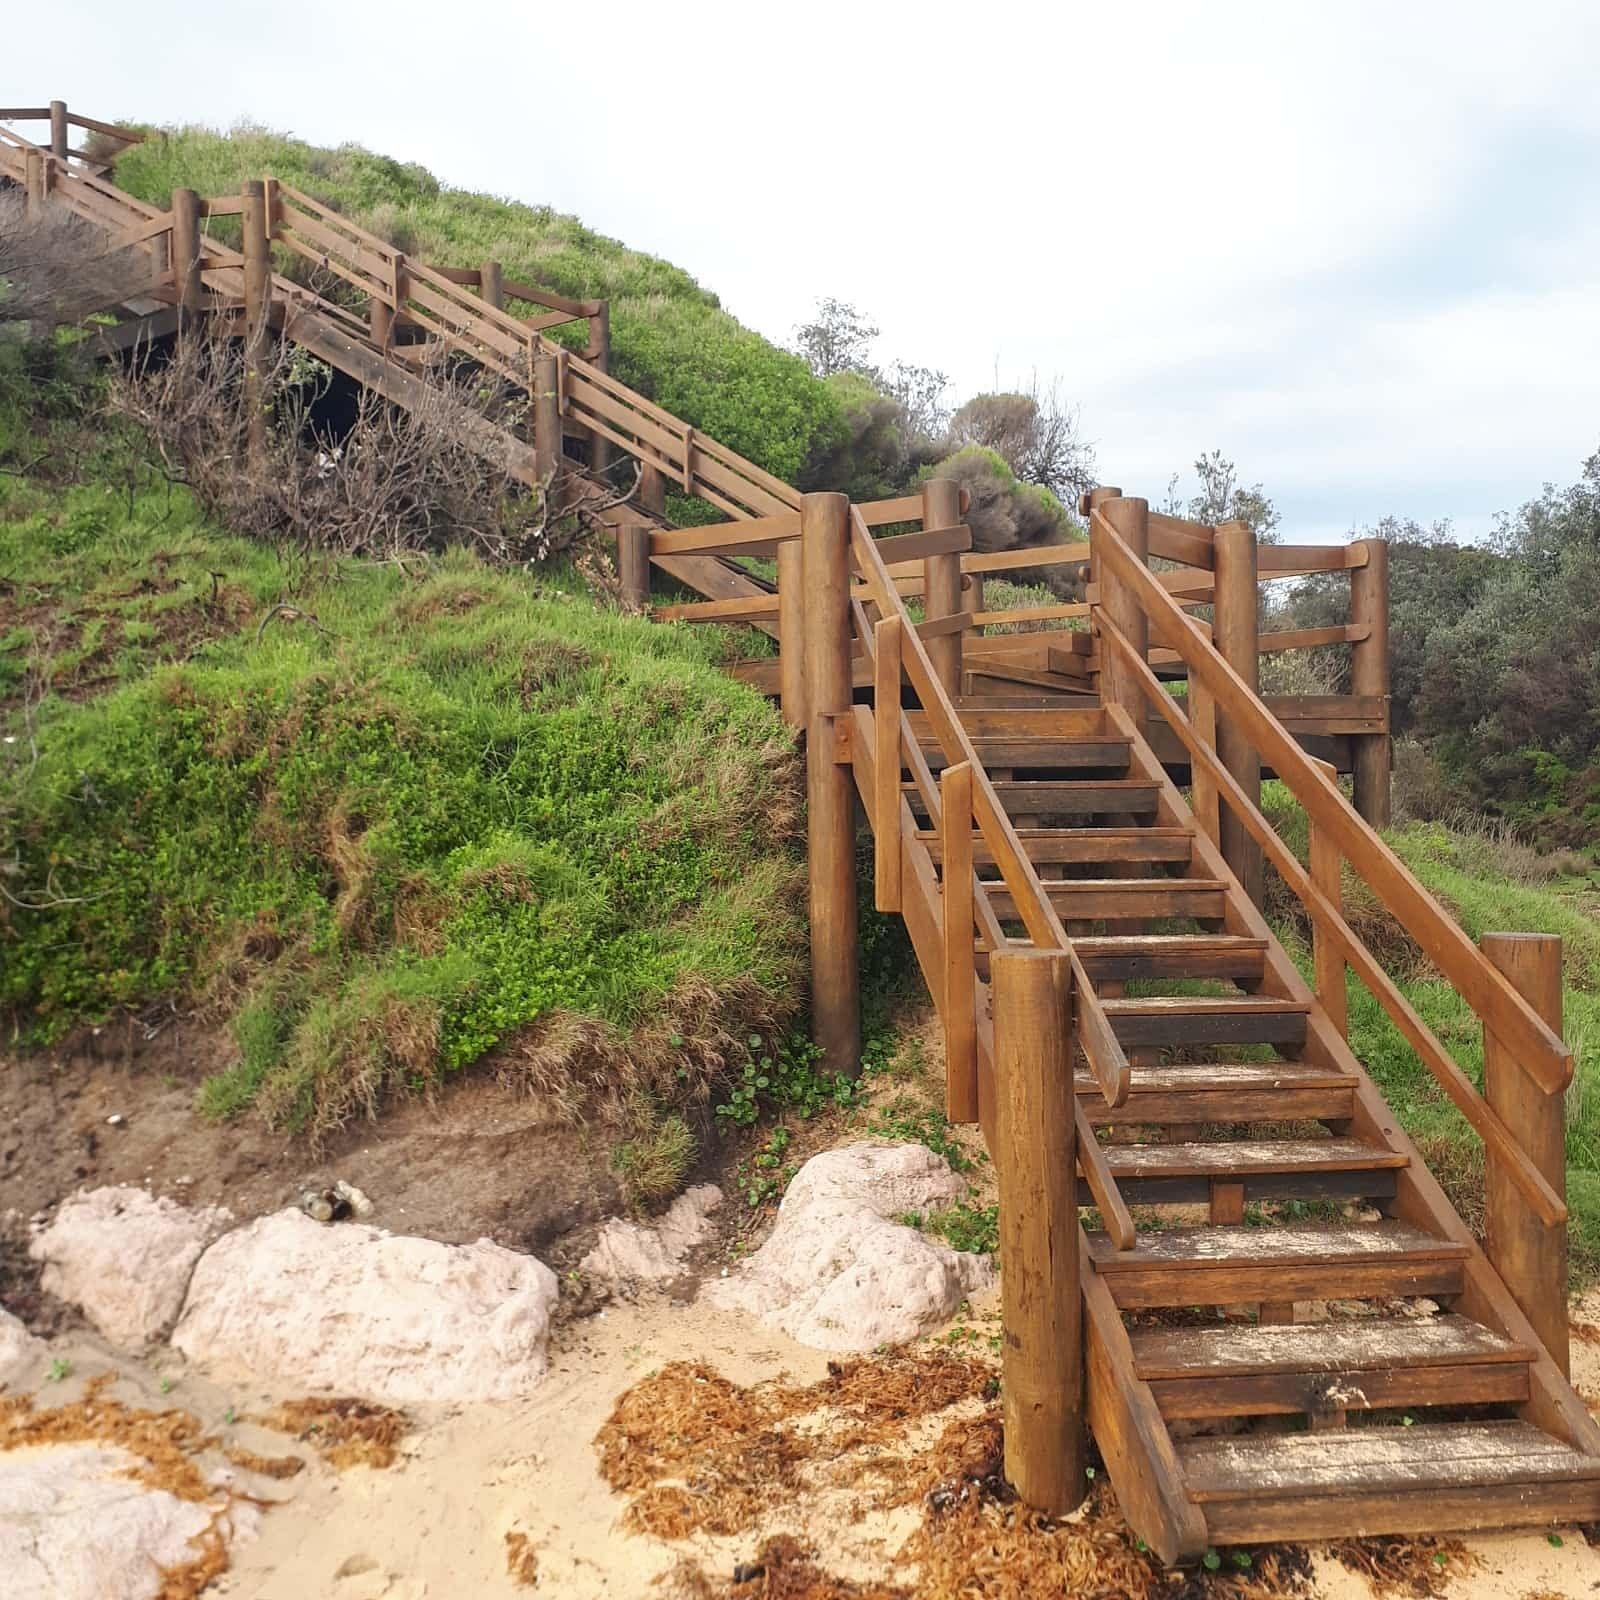 Track construction work to begin at Tura Beach next week